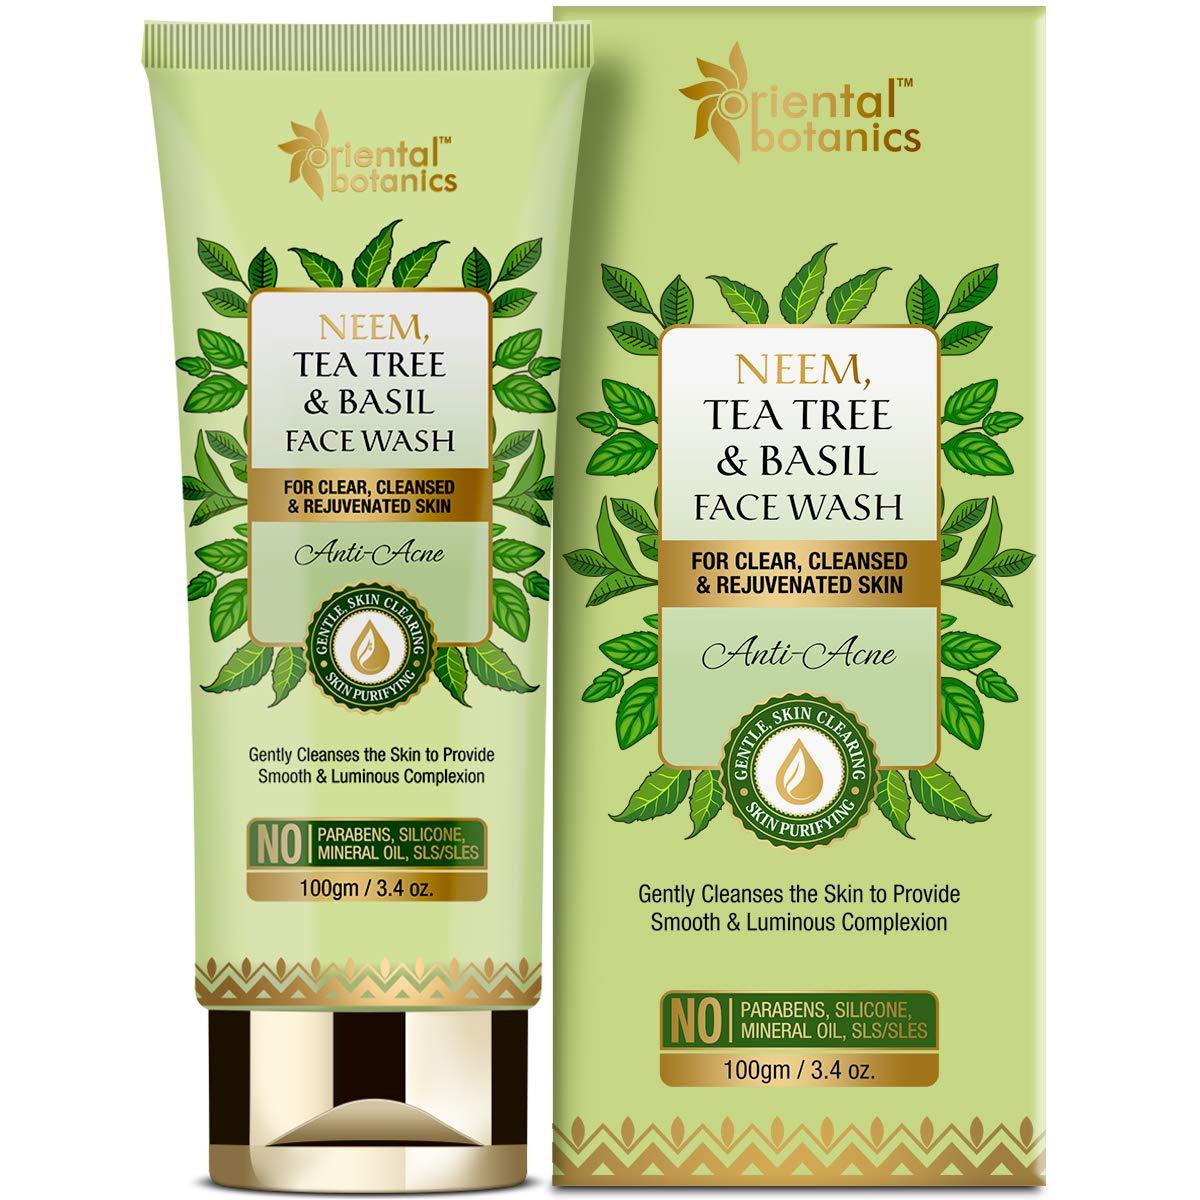 Oriental Botanics Neem Tea Tree Easy-to-use And Max 72% OFF Basil Wash Acne - Face Anti